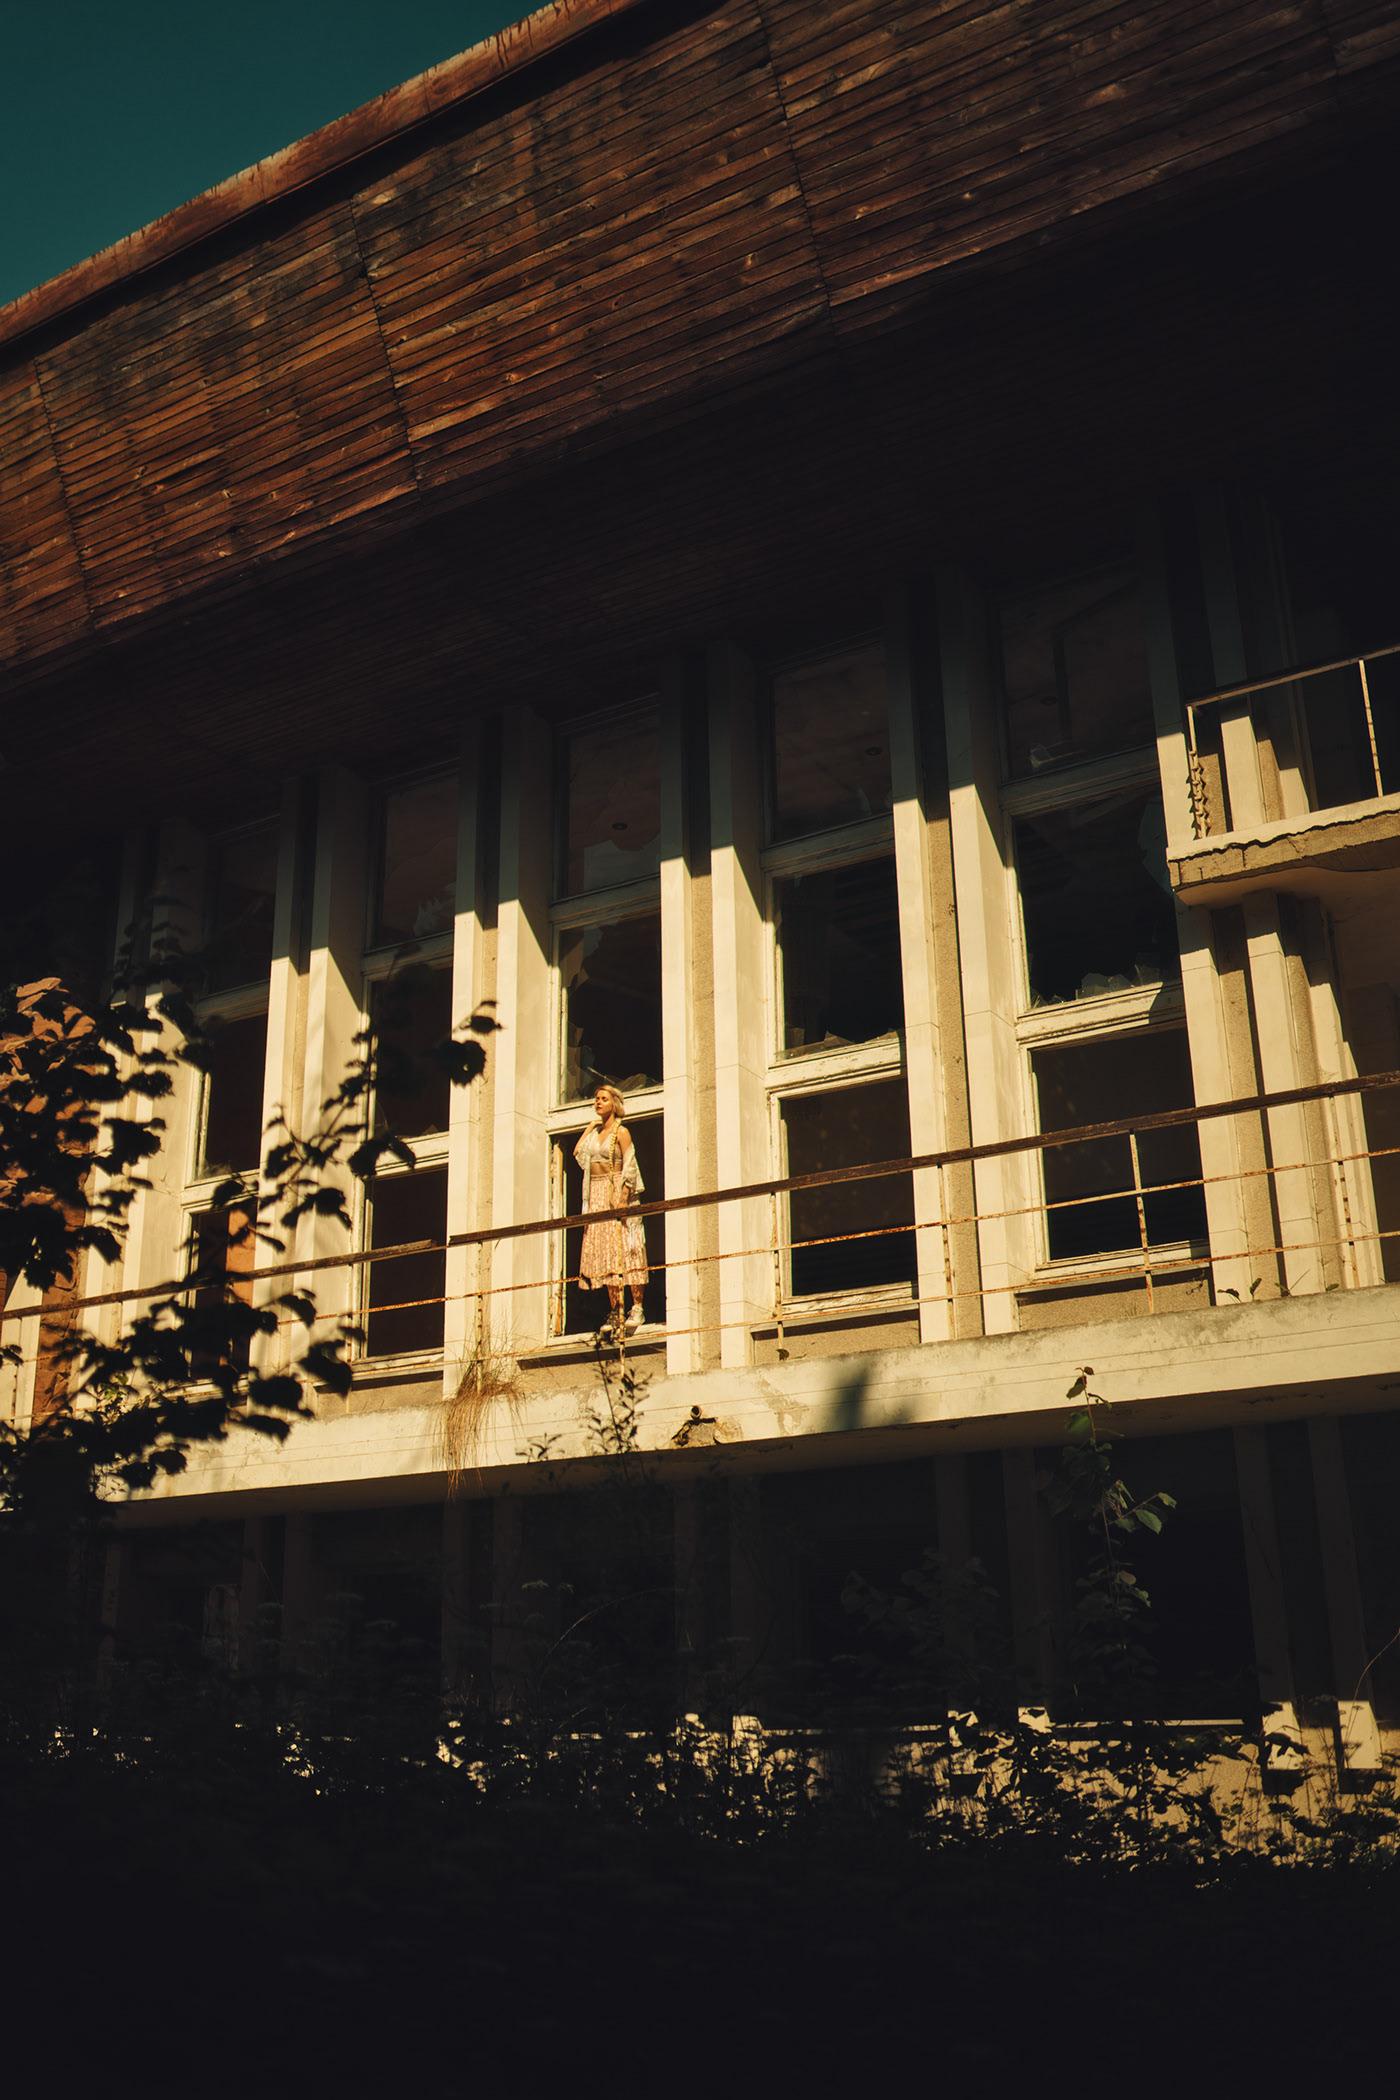 Развалины Abandoned place